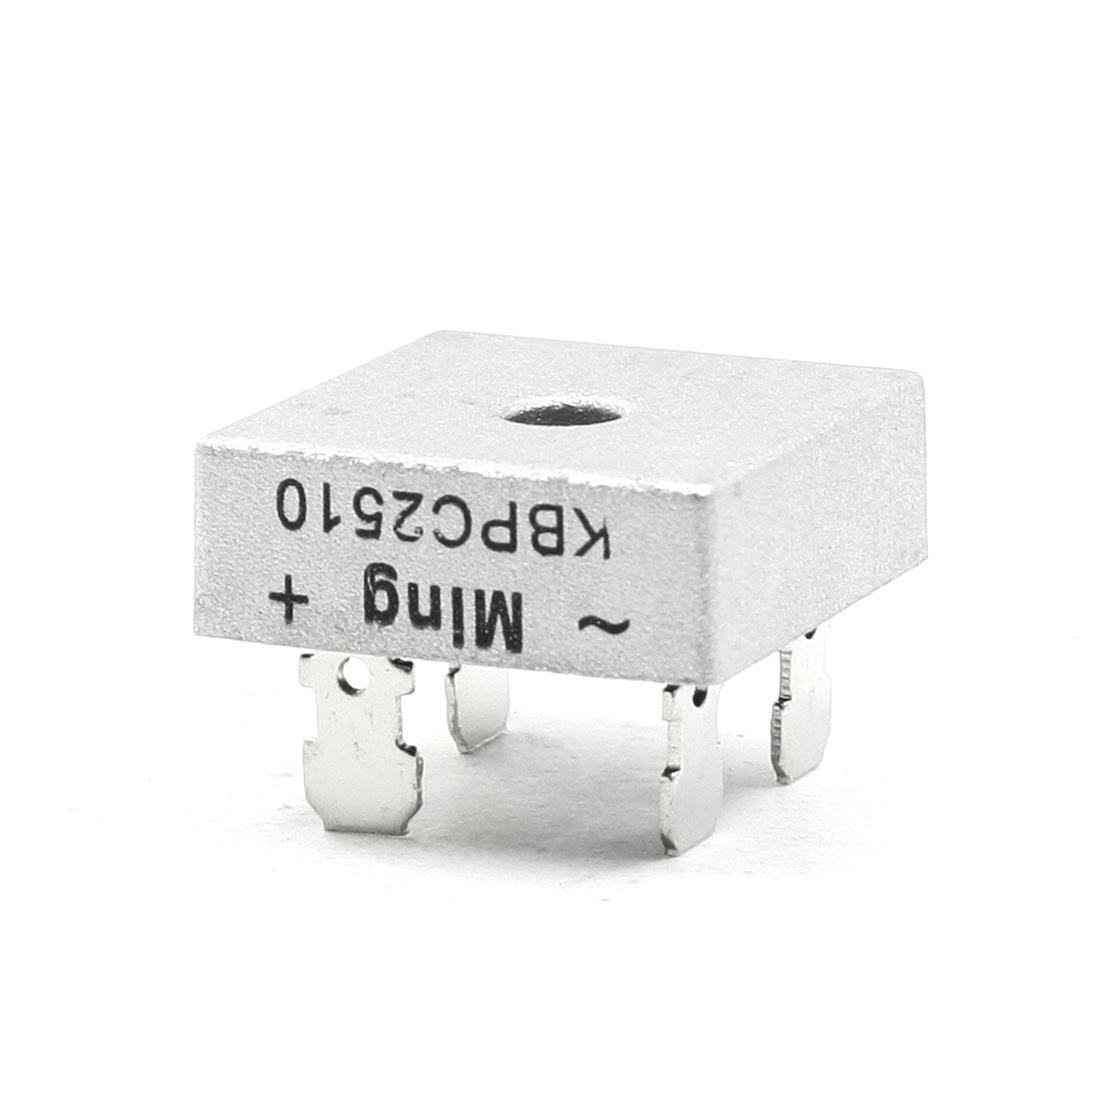 Ming KBPC2510 Power Component 1000V 25A Bridge Rectifier